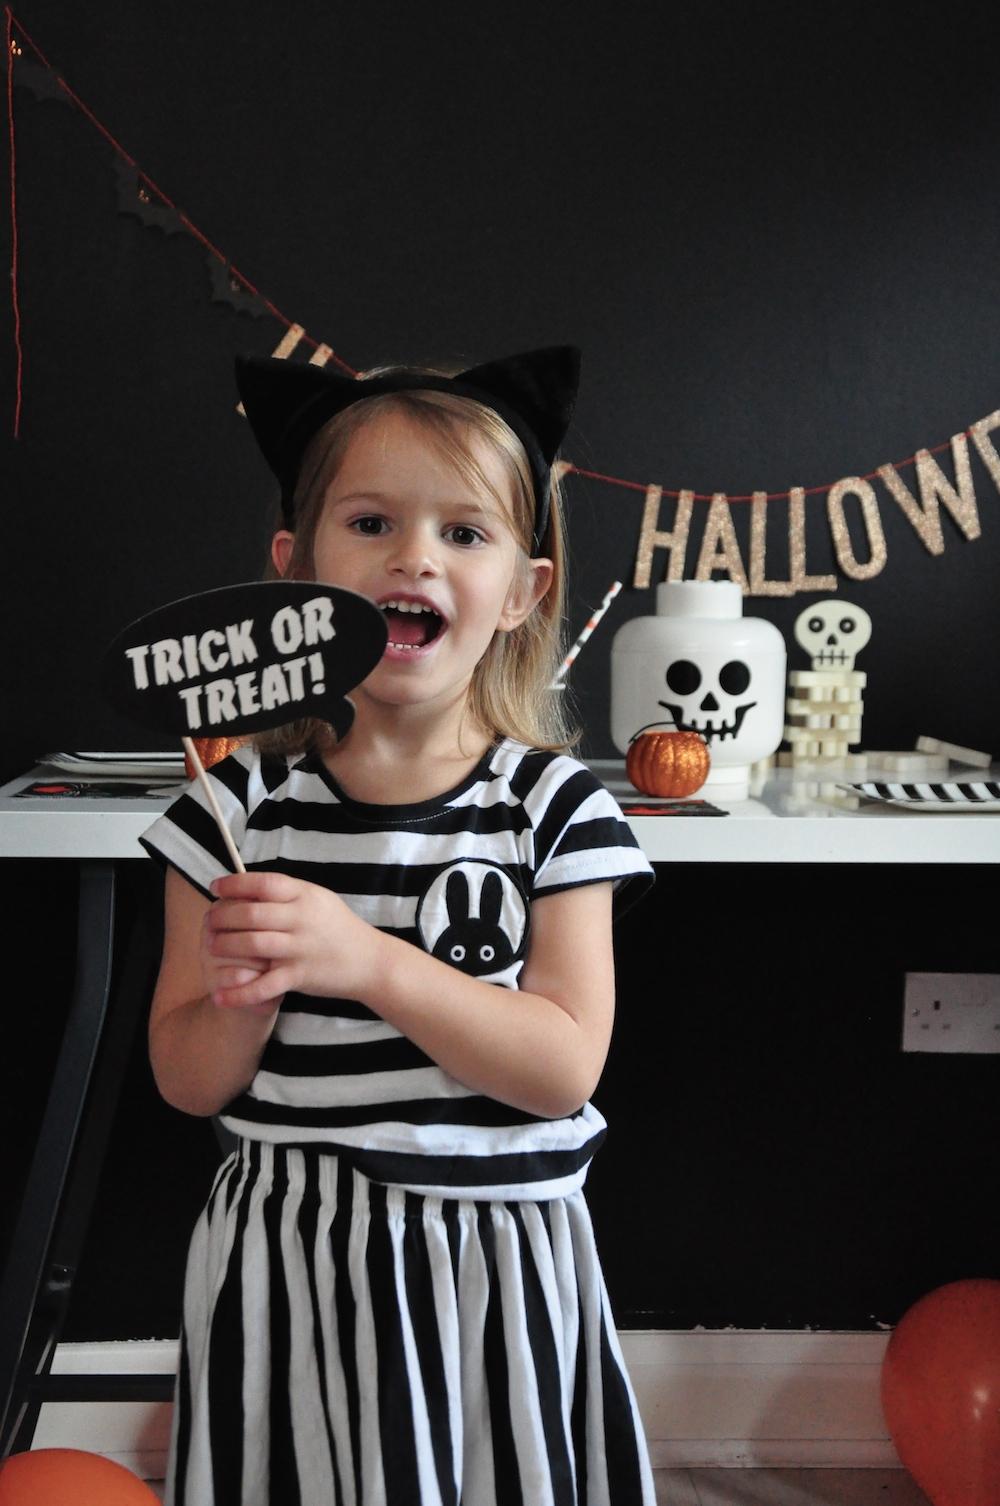 LittleLulubel_halloween_party_shop_trick_or_treat